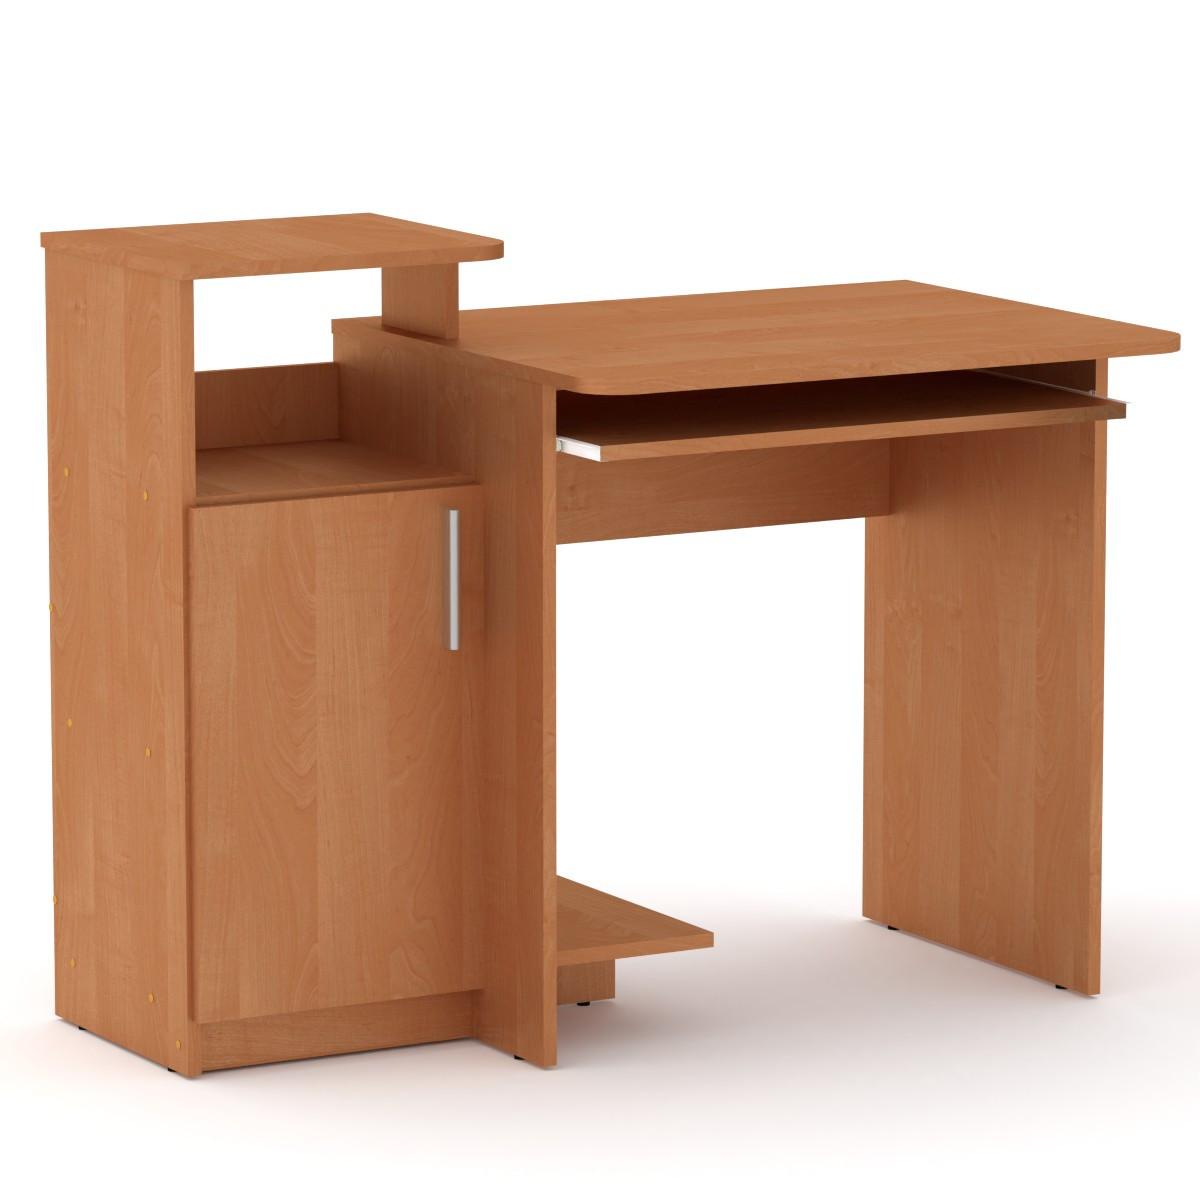 Стол компьютерный Компанит СКМ 2 110х60х87 см Ольха